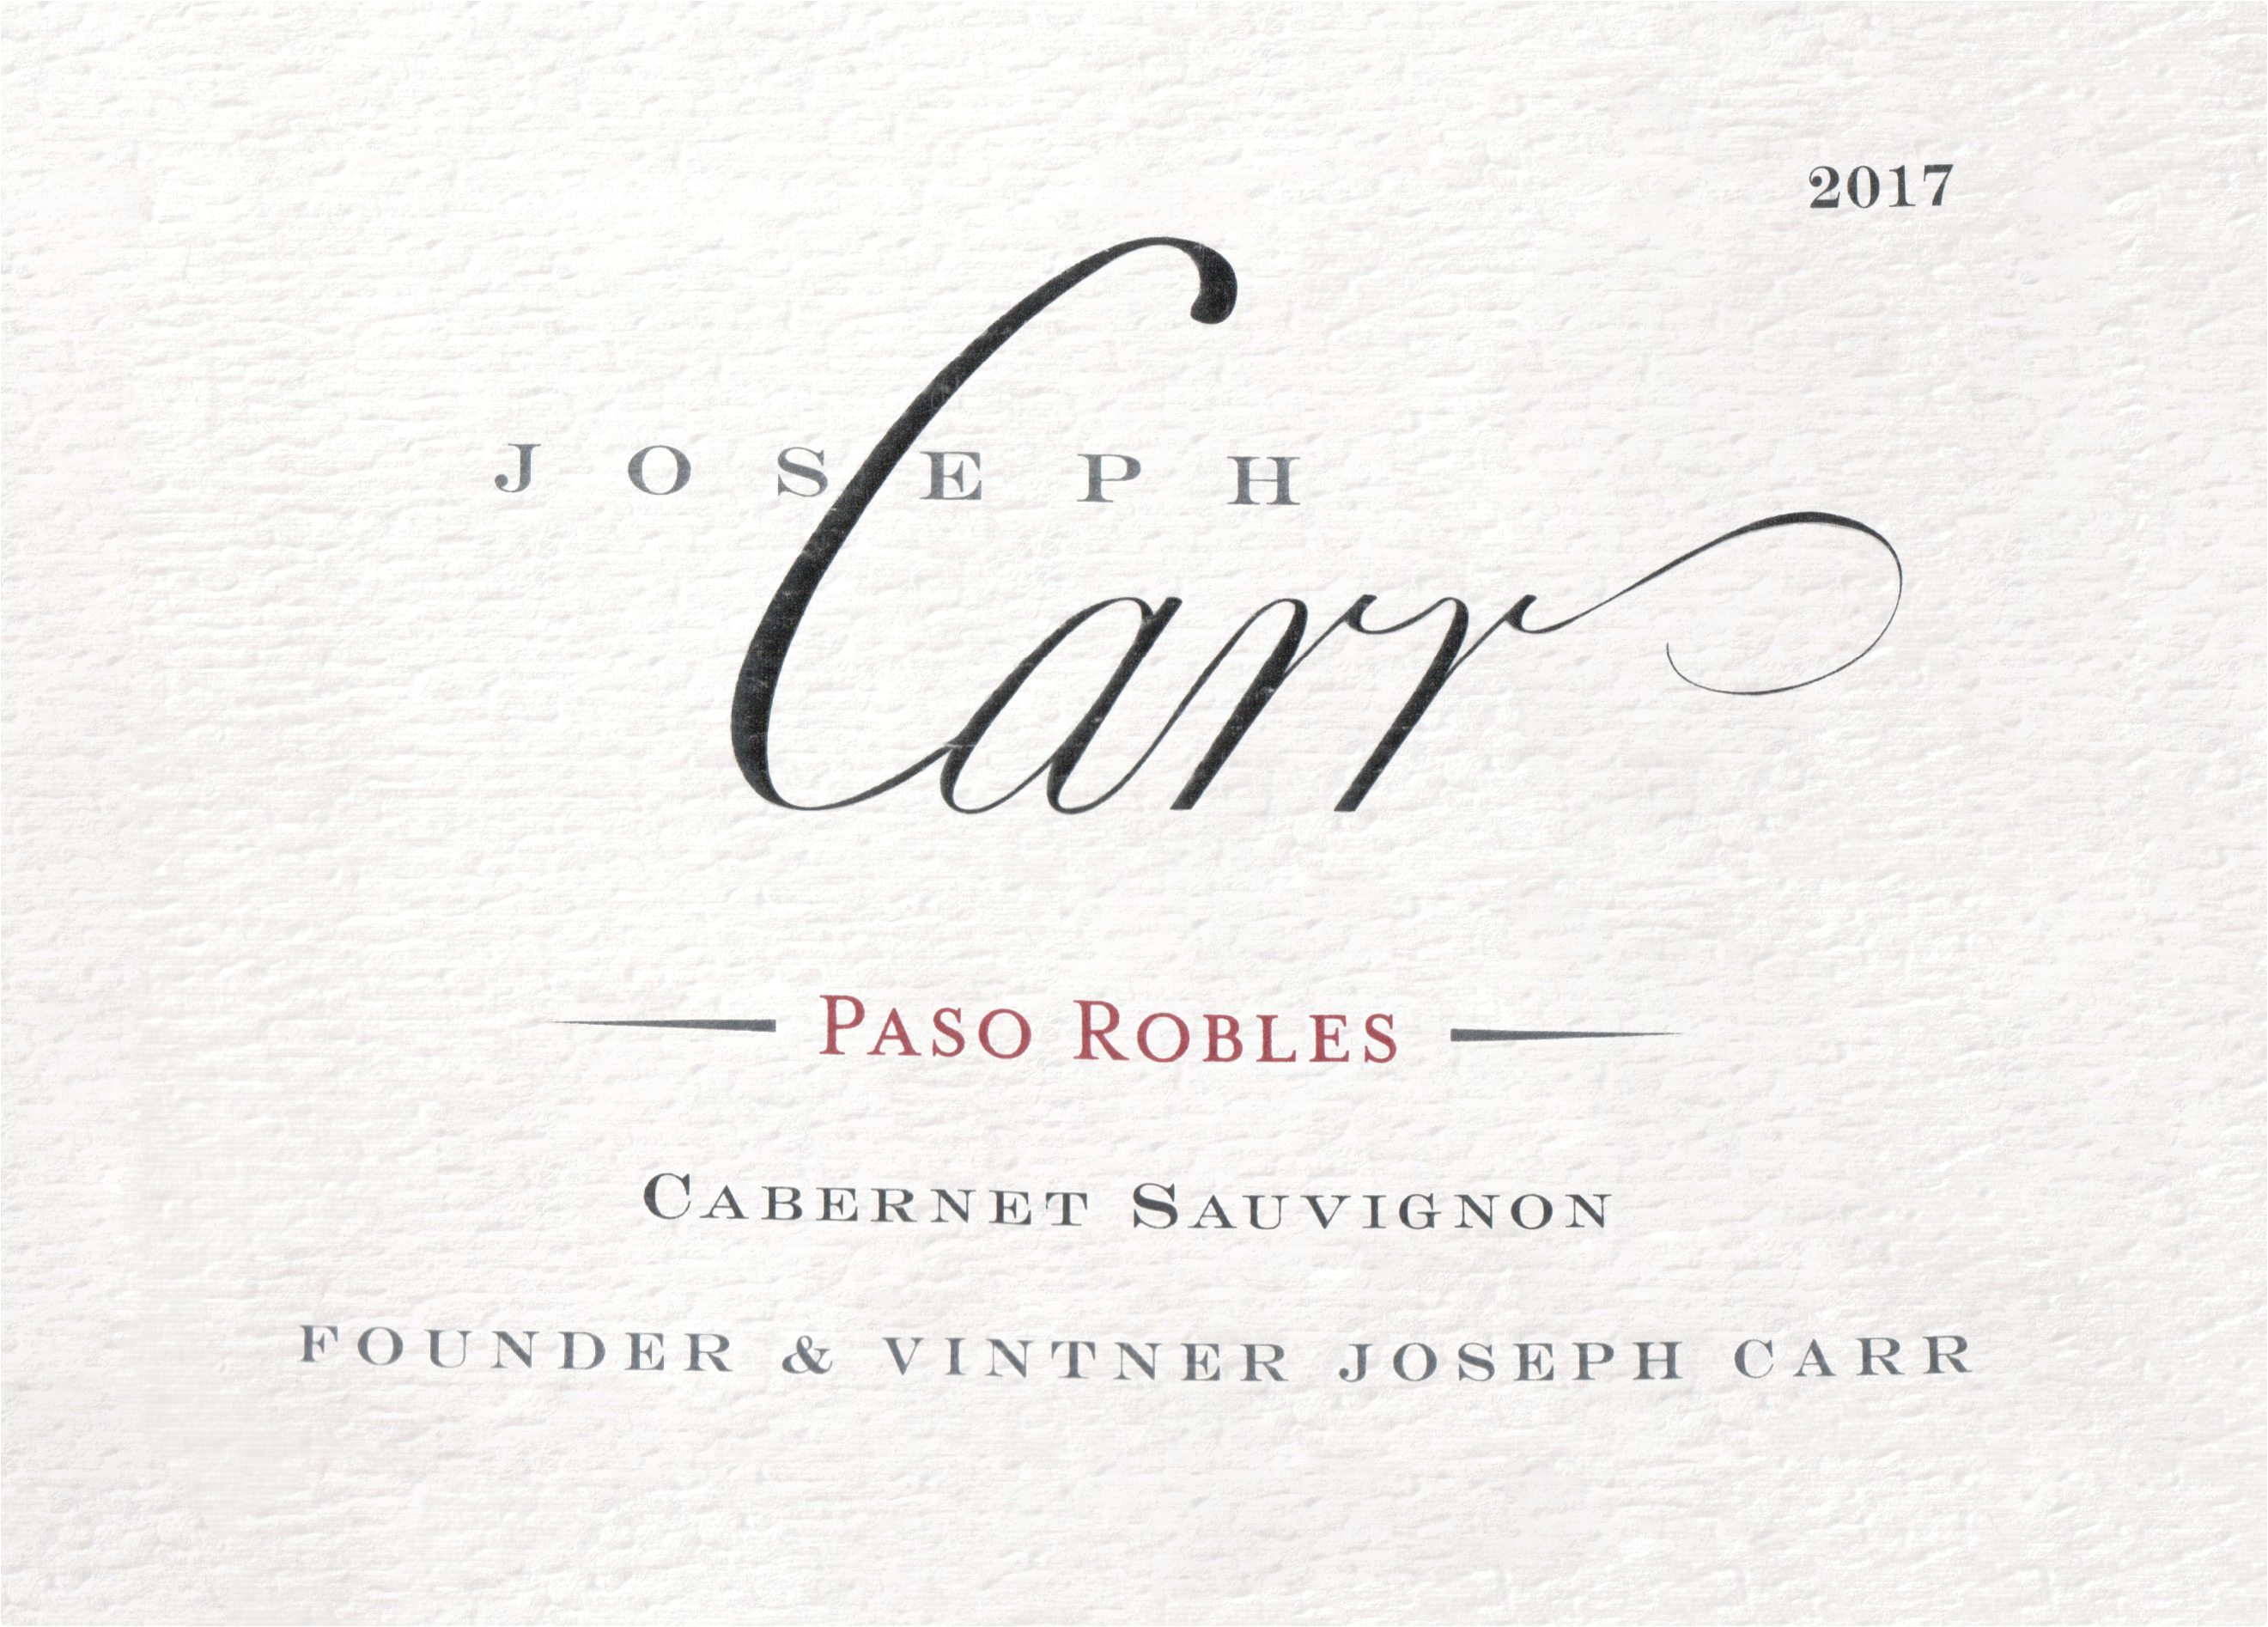 Joseph Carr Paso Robles Cabernet Sauvignon 2017